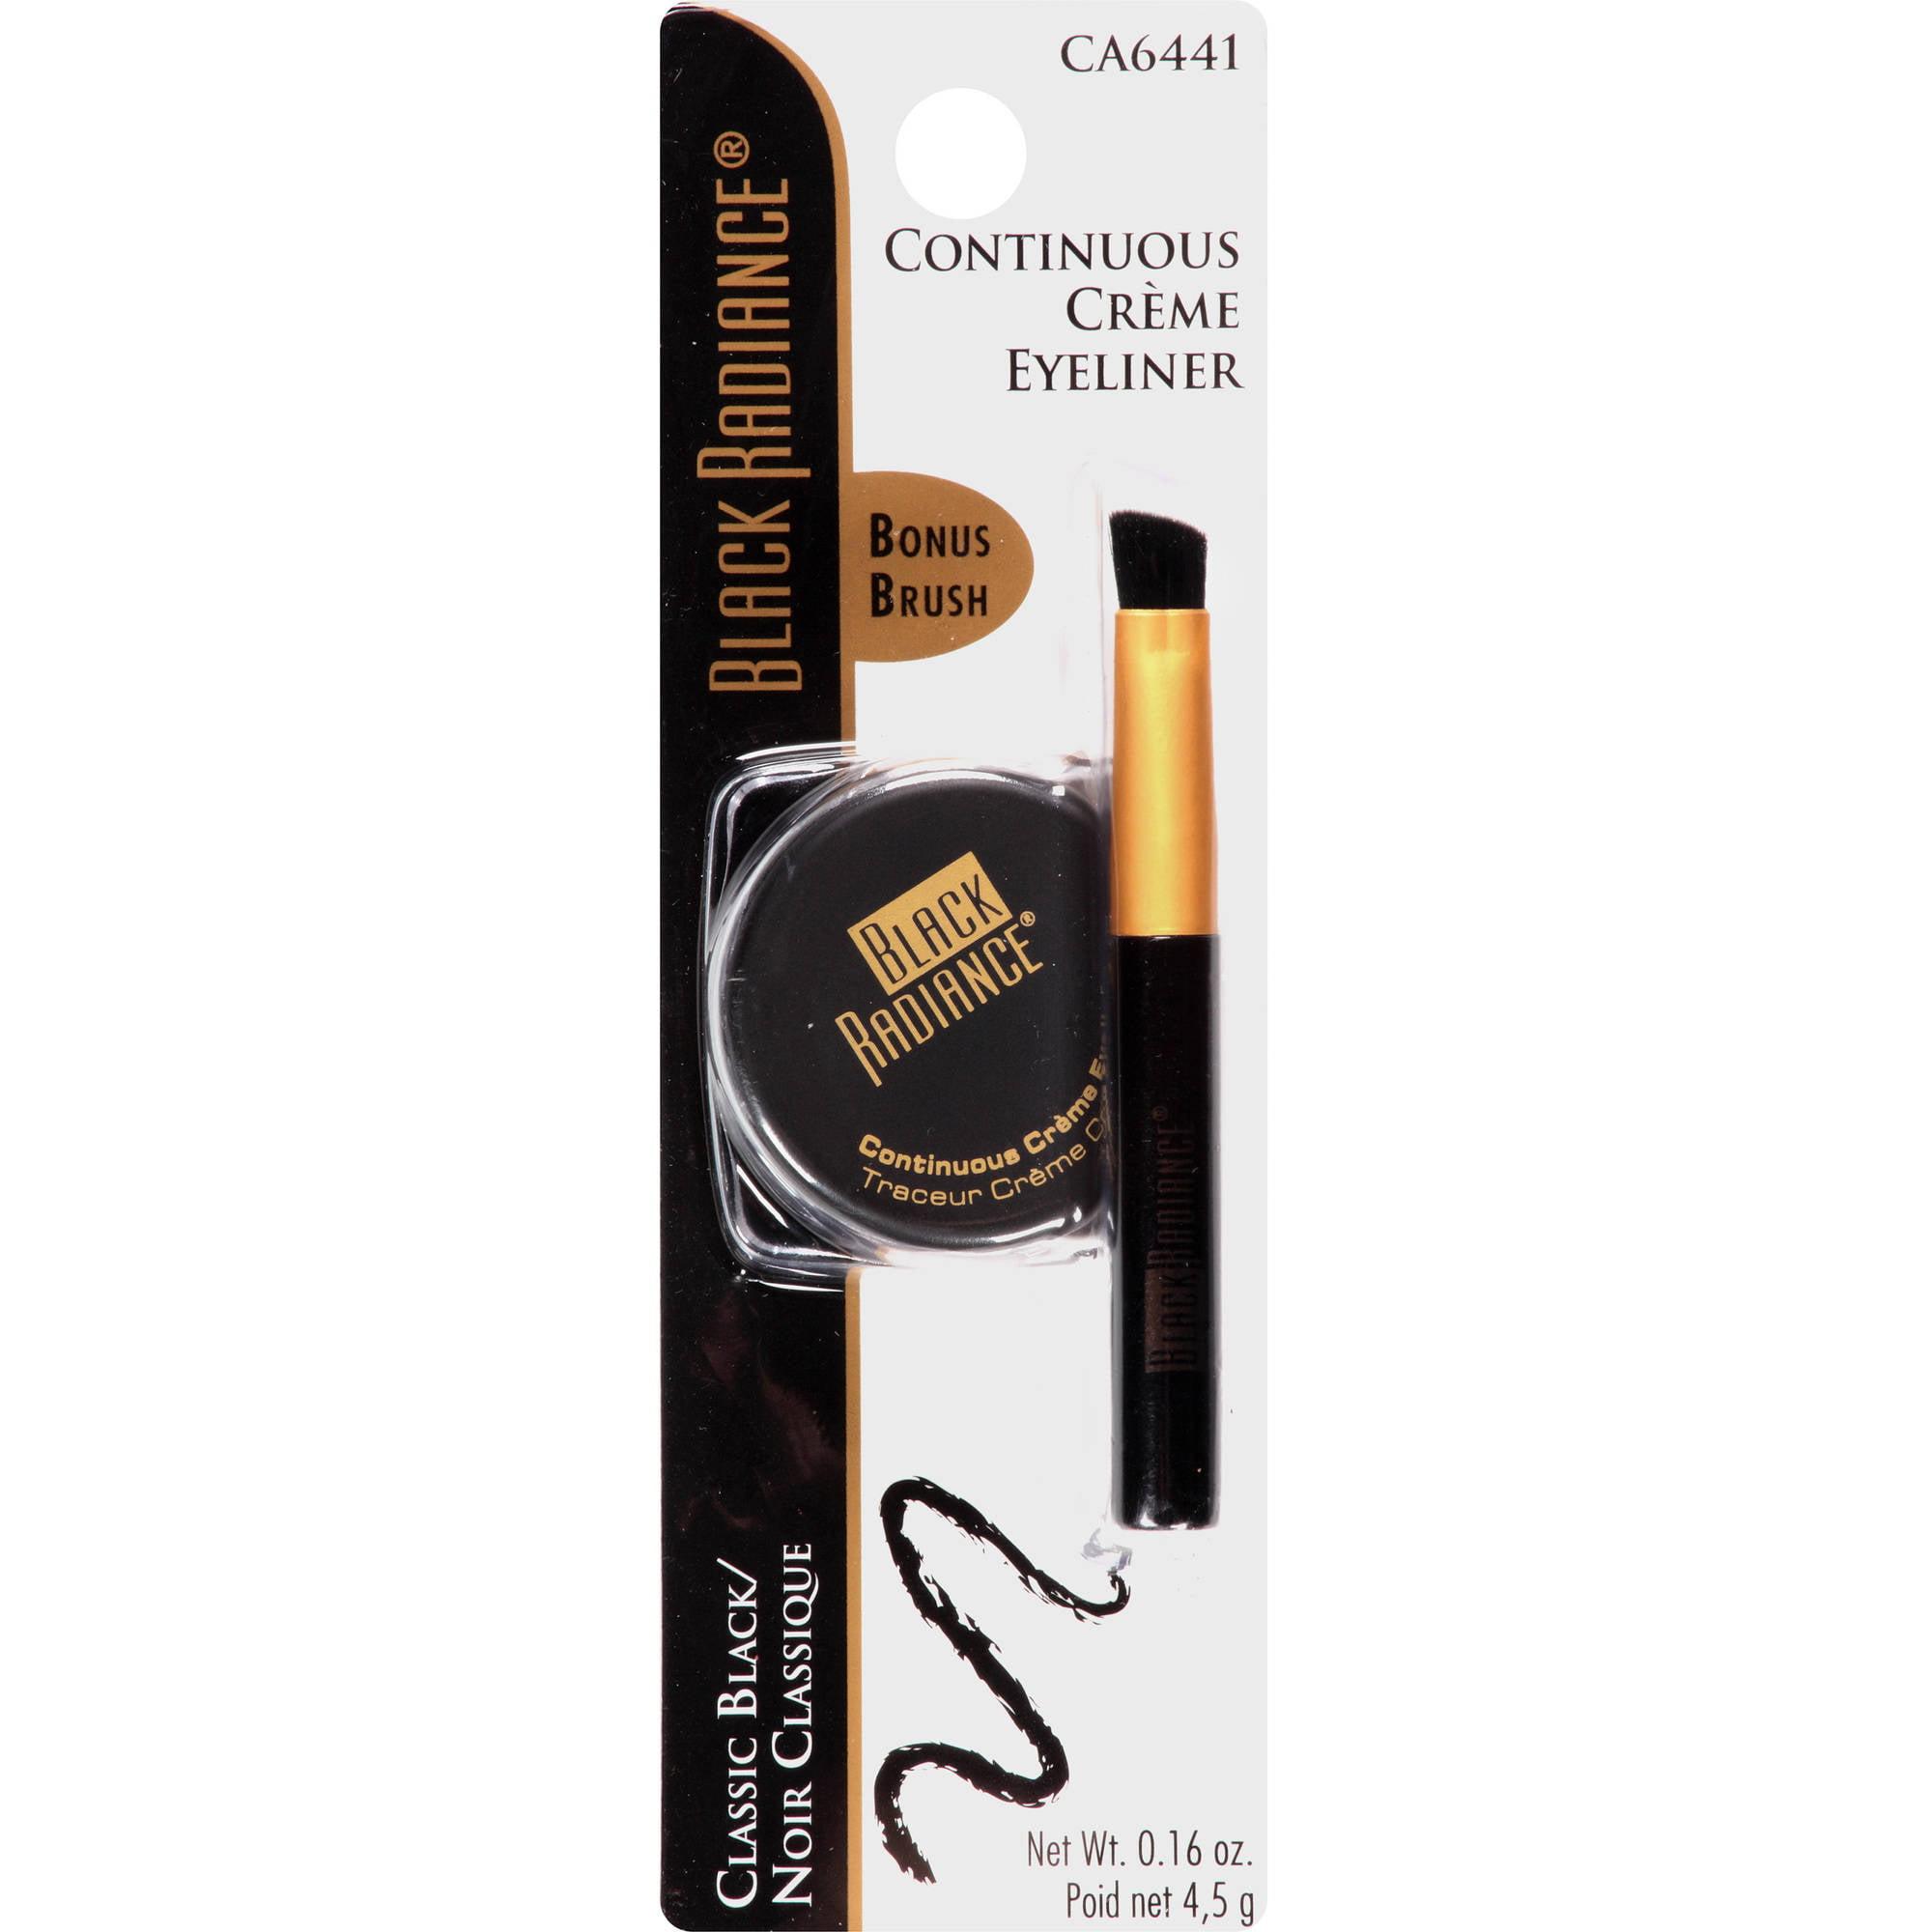 Black Radiance Continuous Creme Eyeliner, CA6441 Classic Black, 0.16 oz